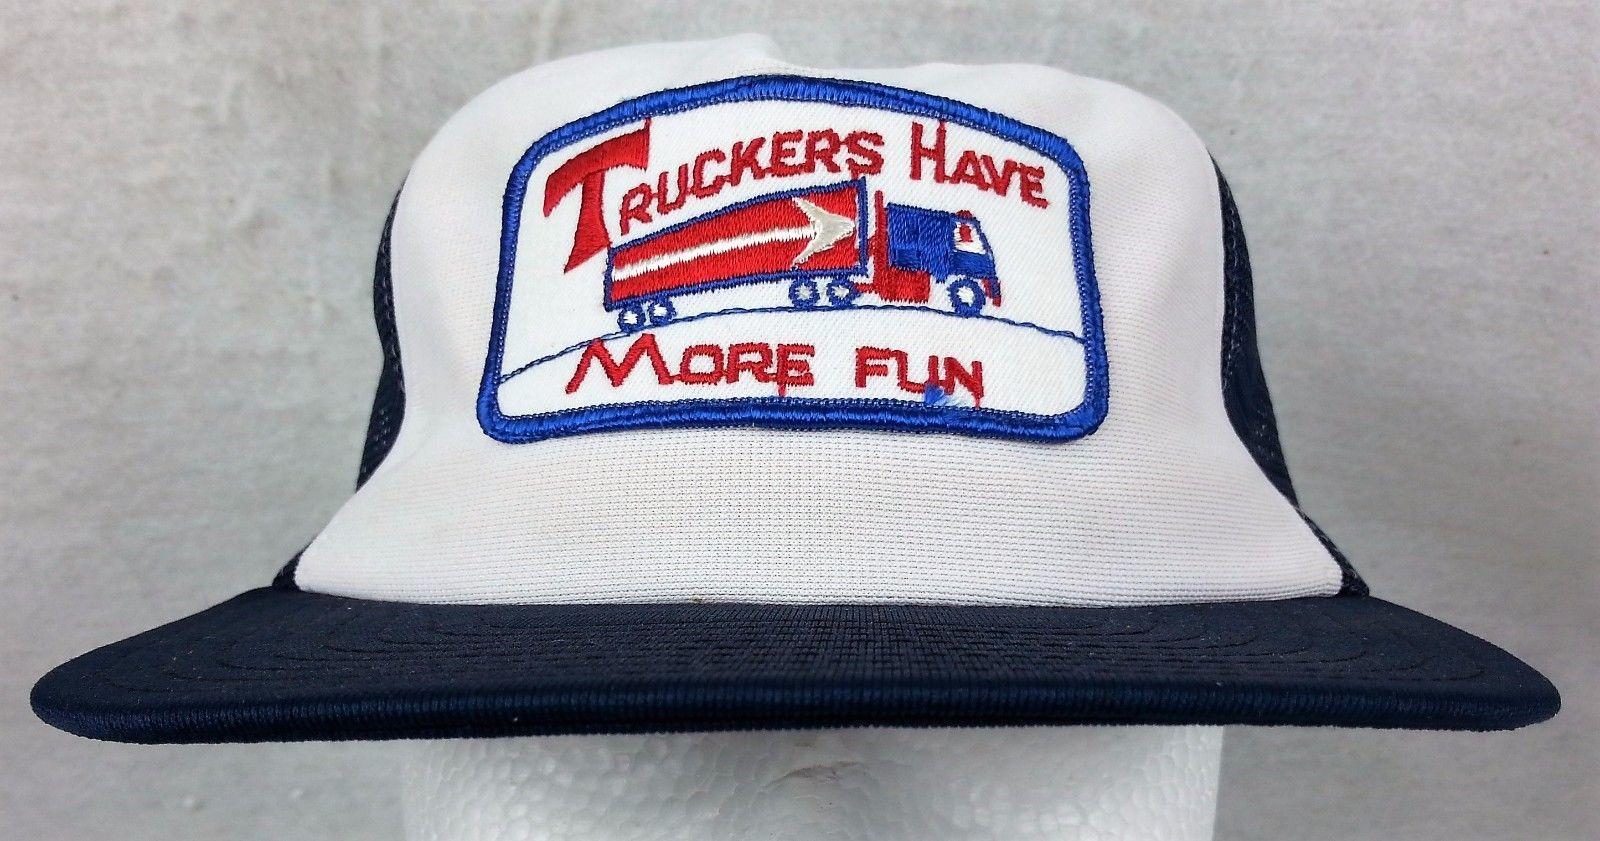 Truckers Have More Fun Trucker Hat Ball Cap and similar items. S l1600 e45e02c28ce9